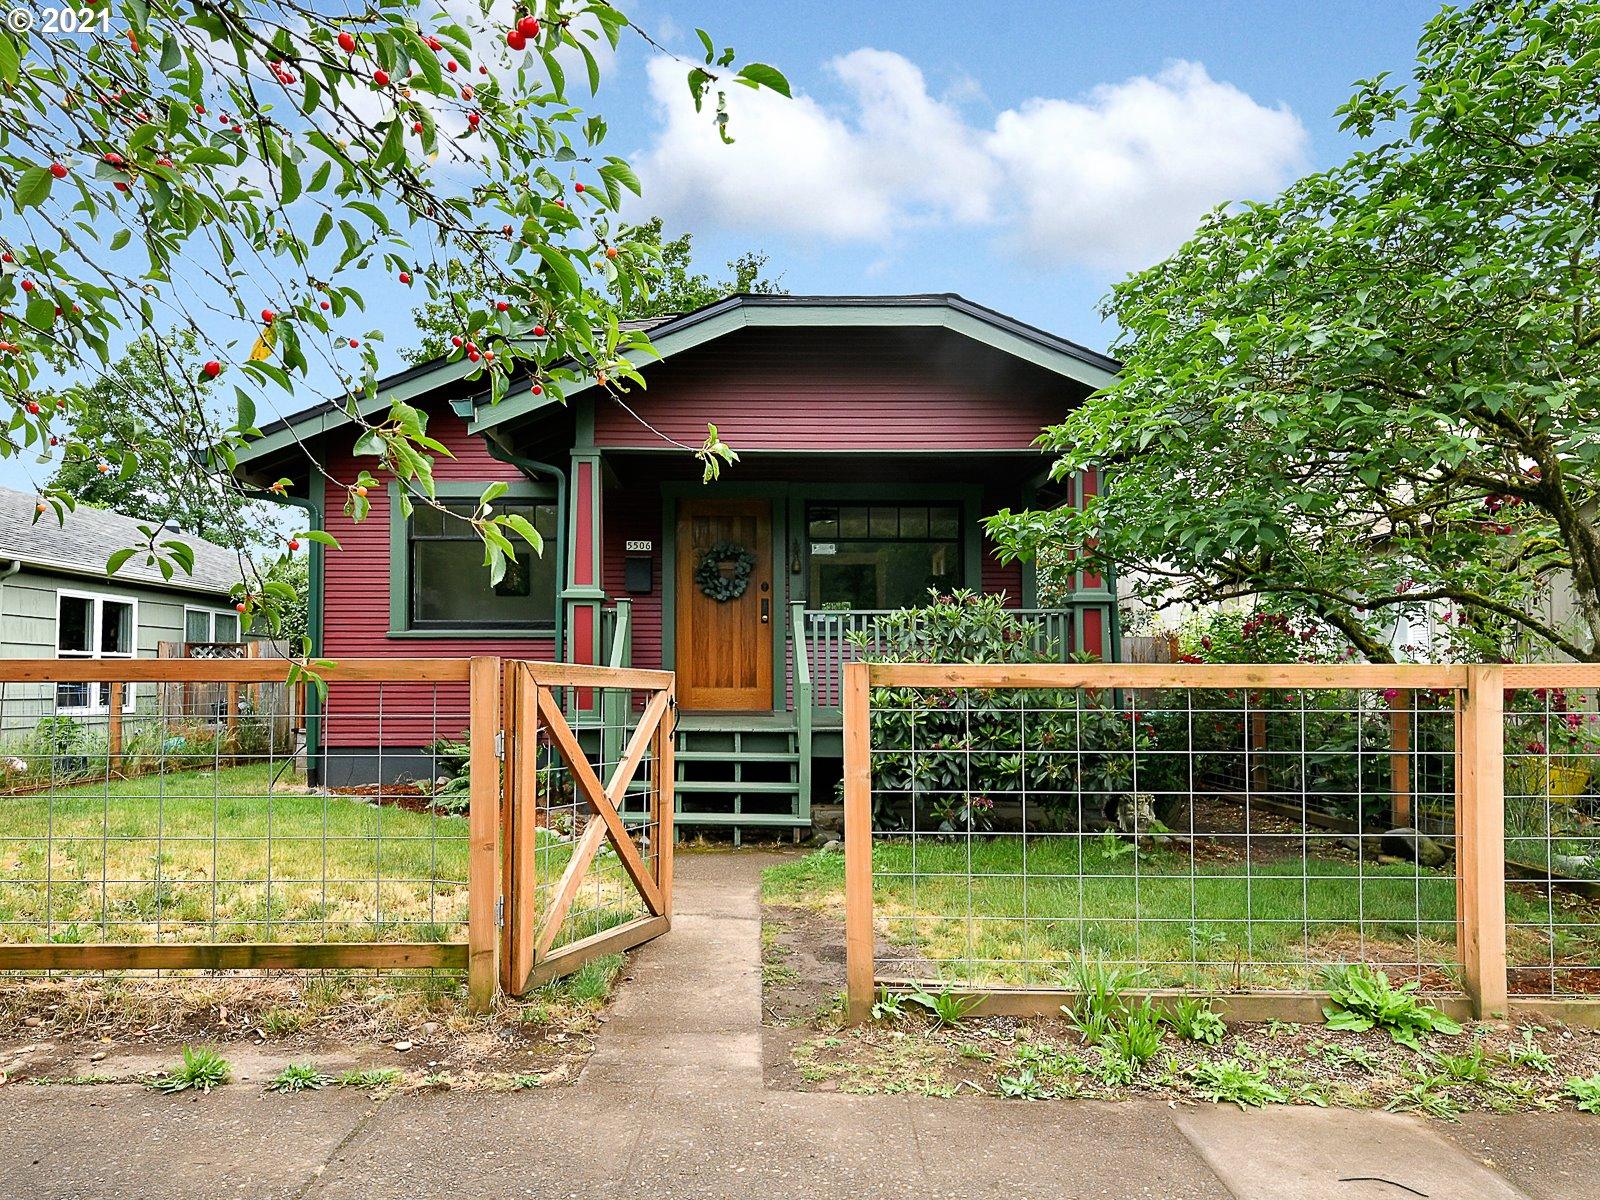 5506 SE RAMONA ST, Portland OR 97206